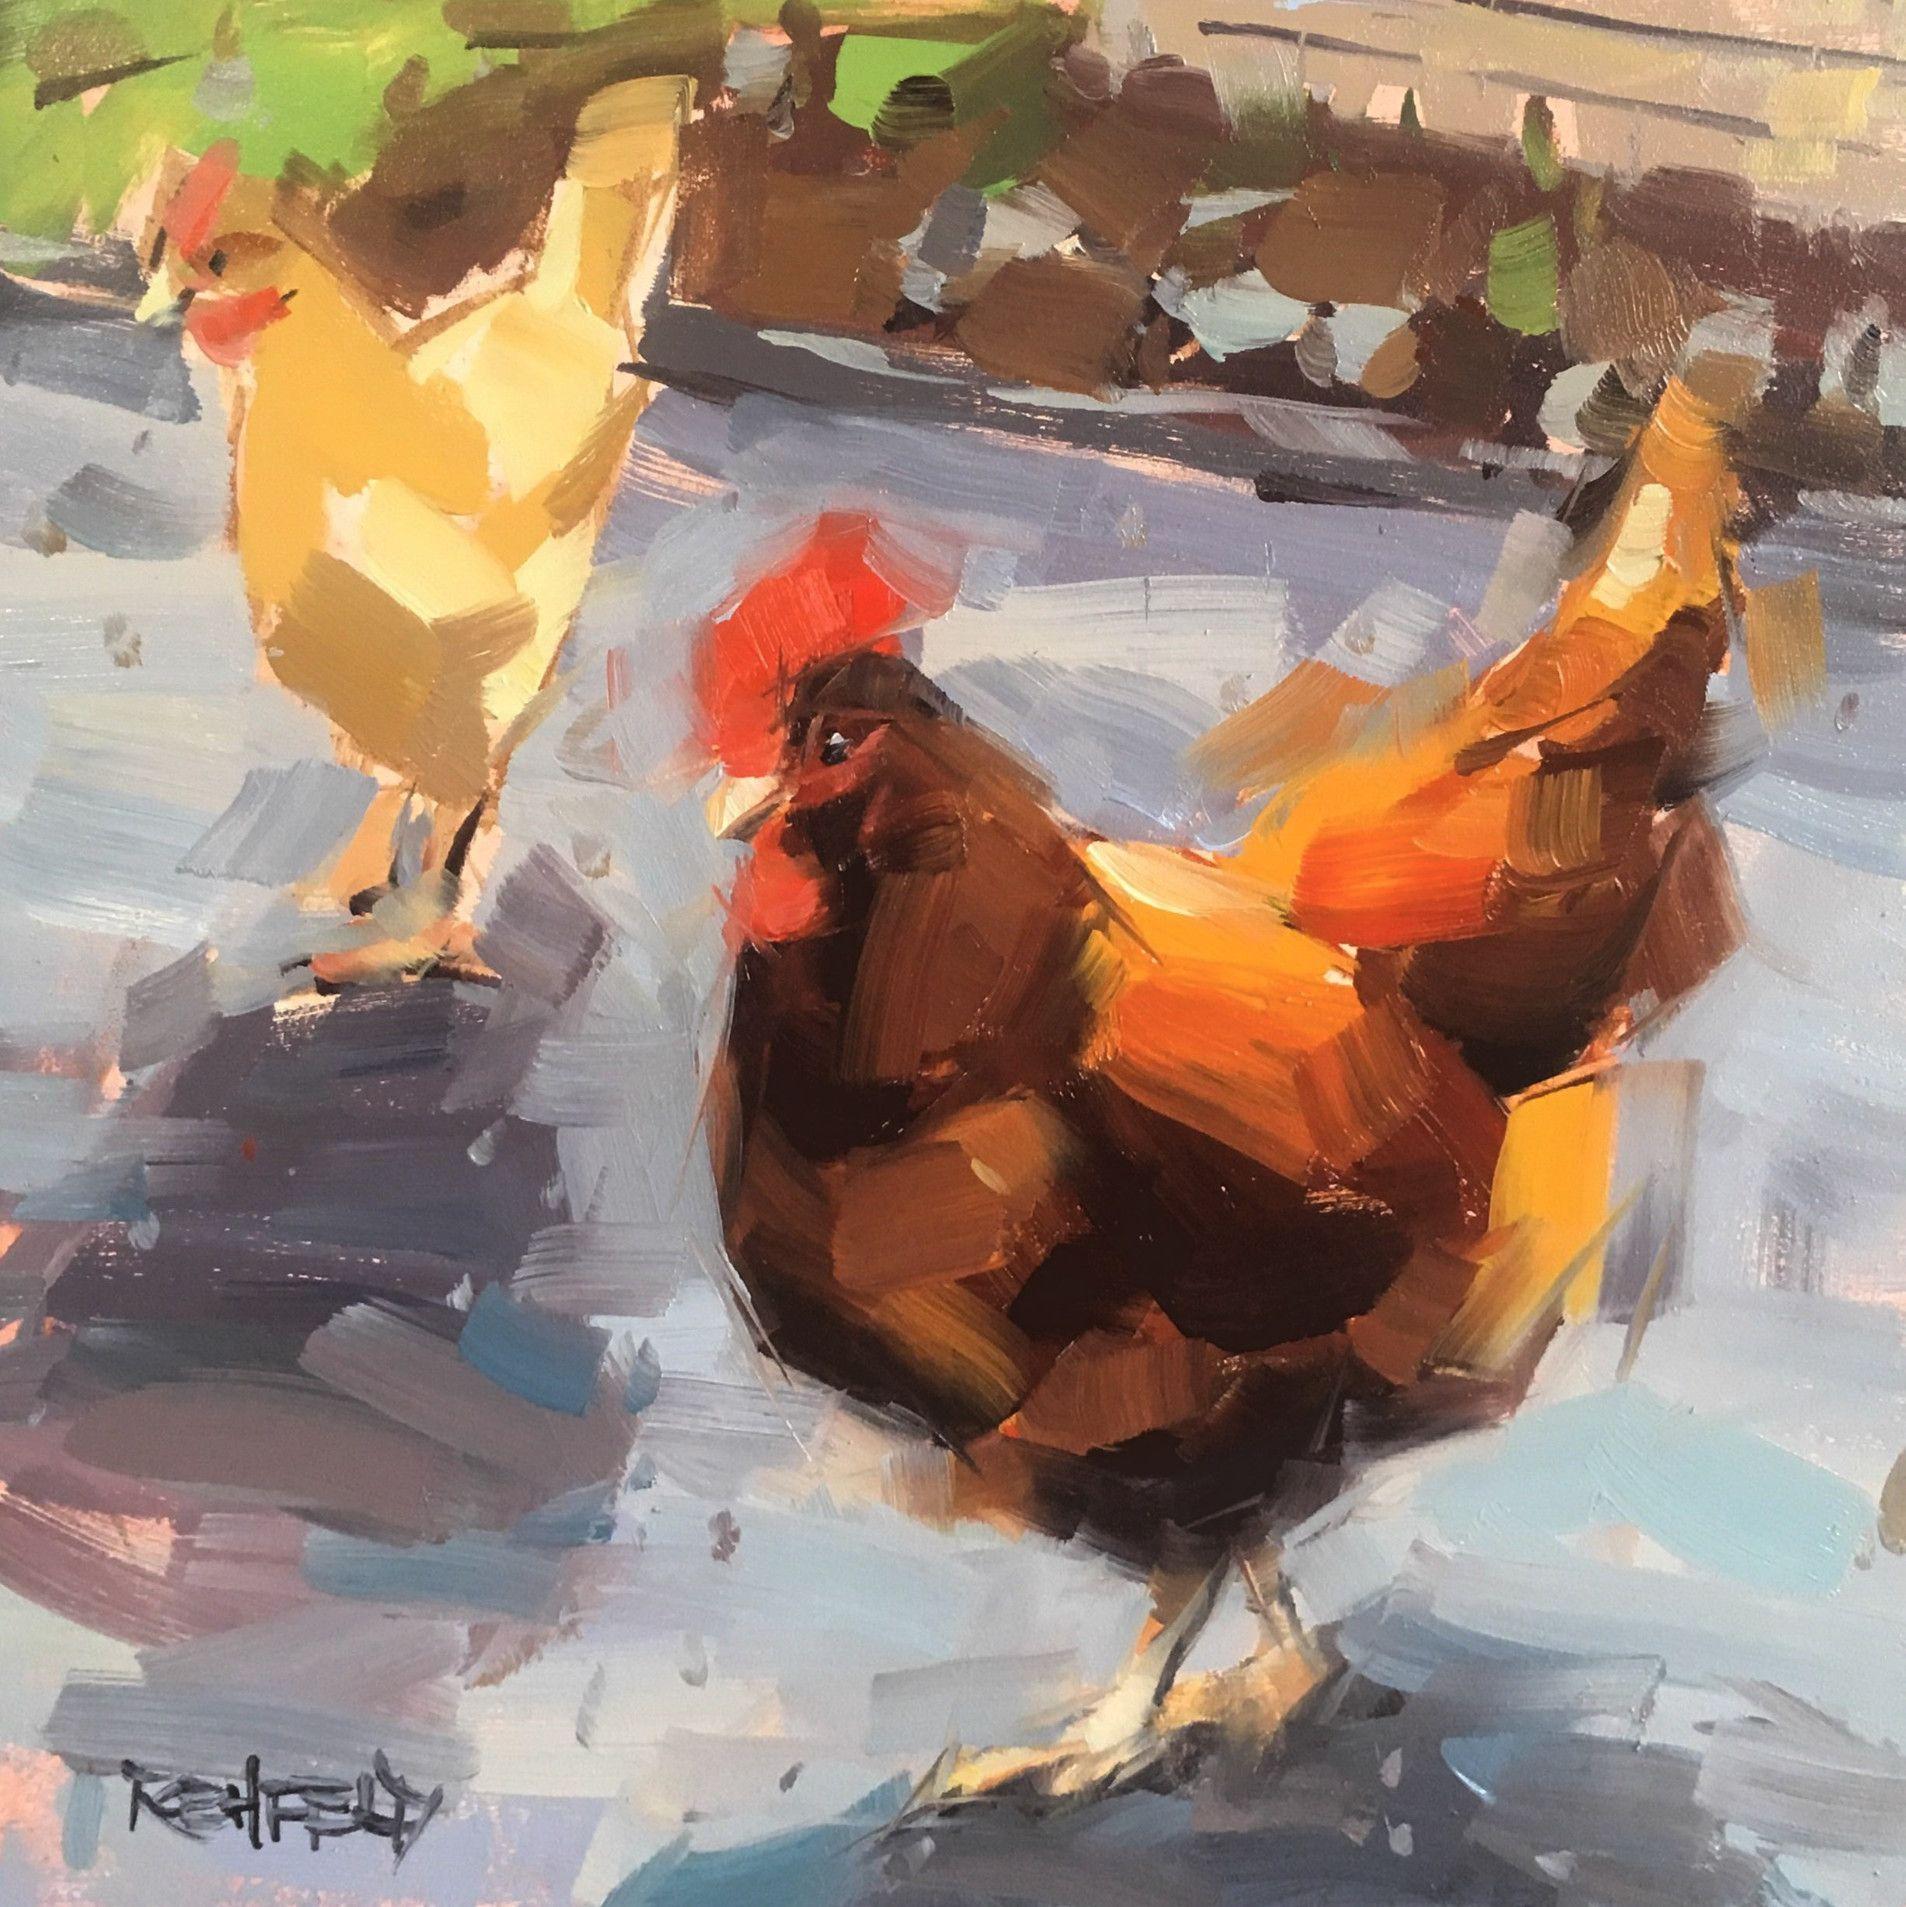 Pin by ömer kalelioğlu on Art   Pinterest   Paintings, Oil and ...